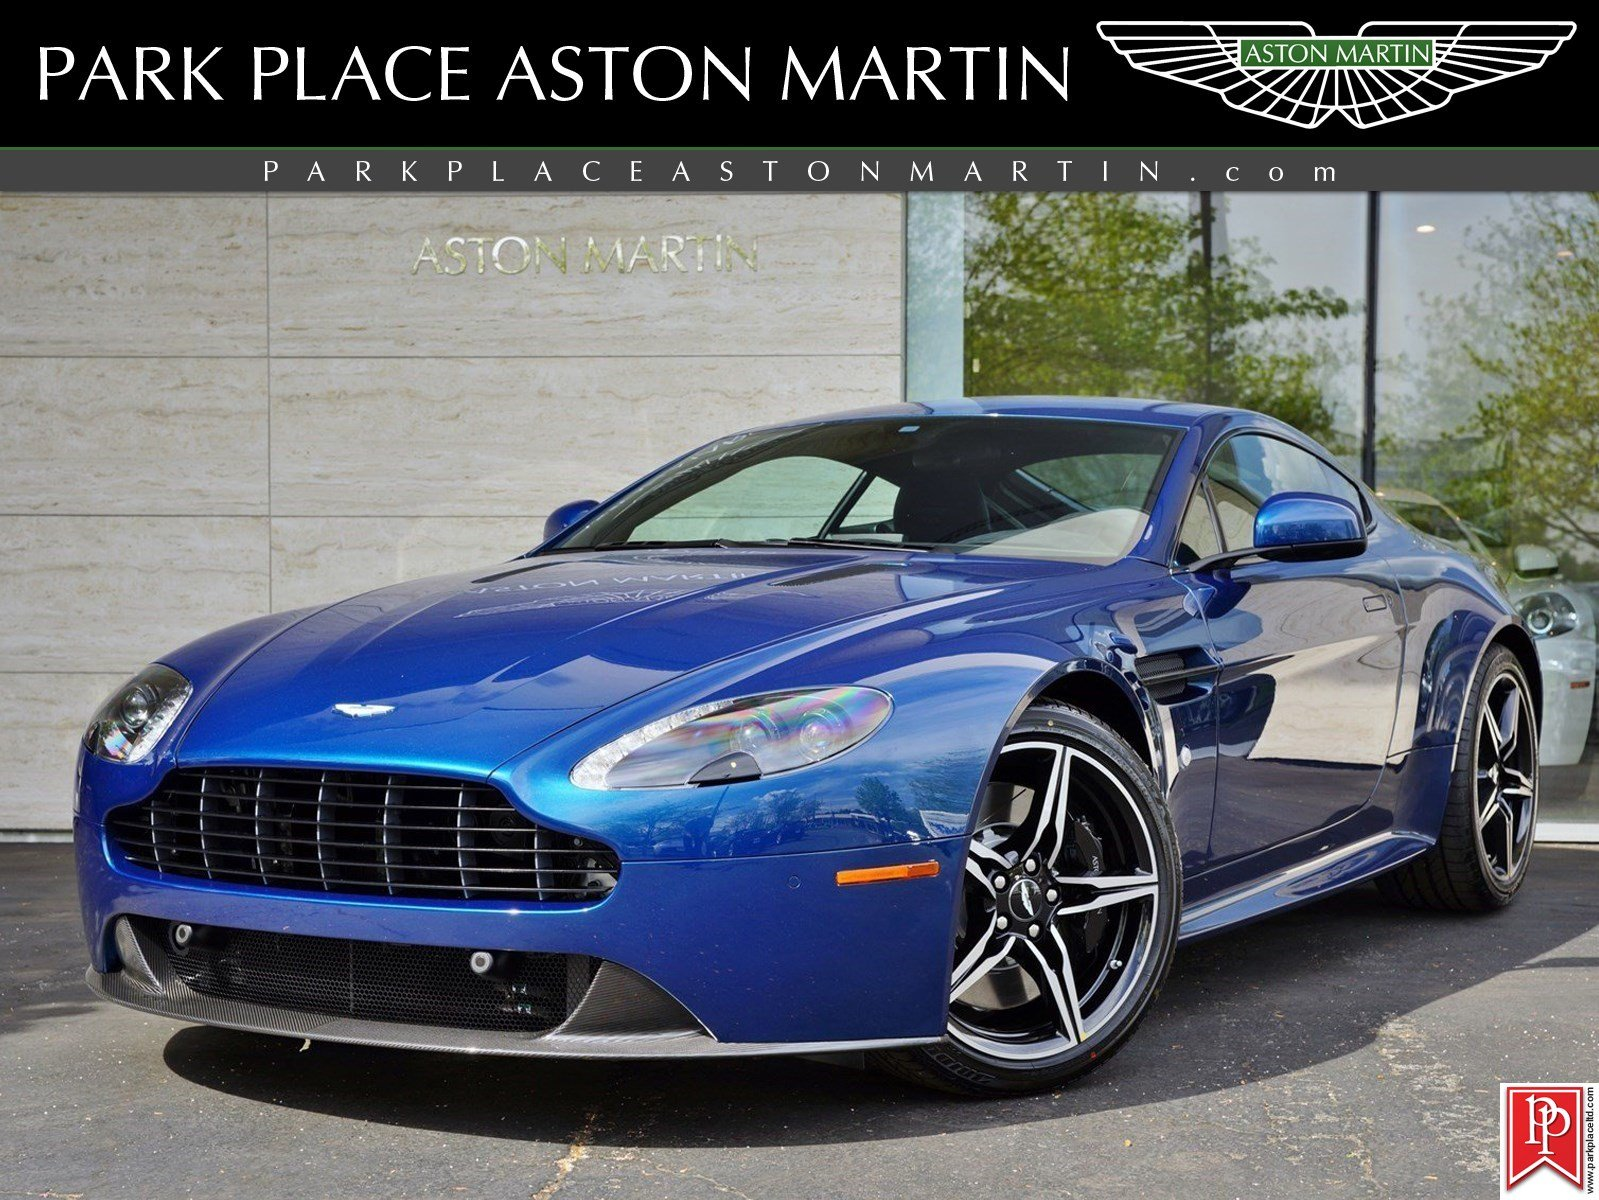 Models Park Place Aston Martin Official Aston Martin Mandegarinfo - Park place aston martin